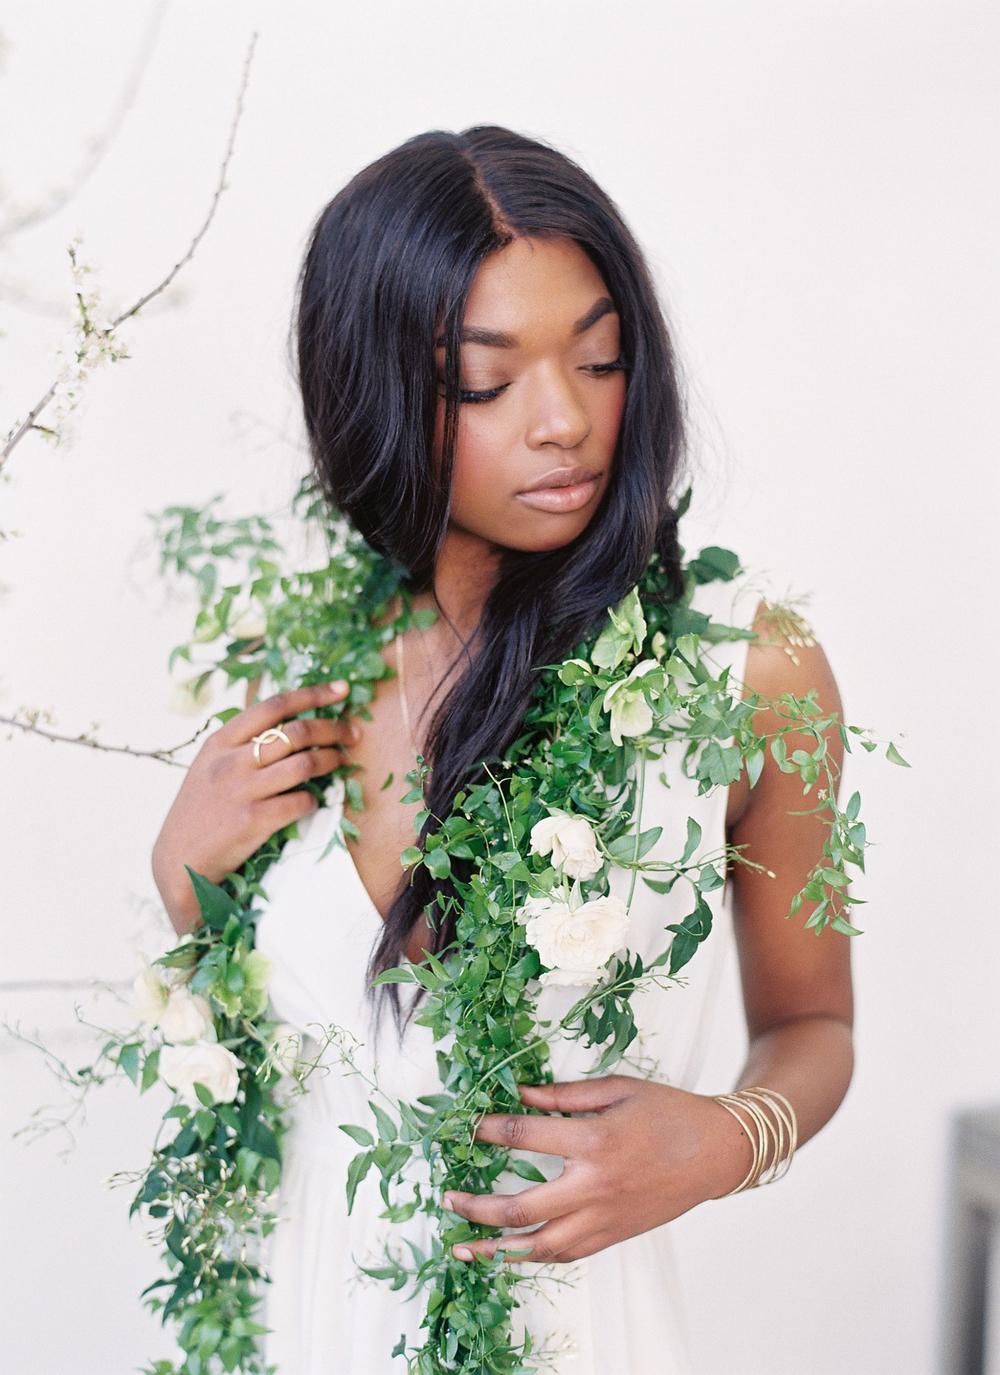 Floralessence-Esmeraldafranco-36.JPG